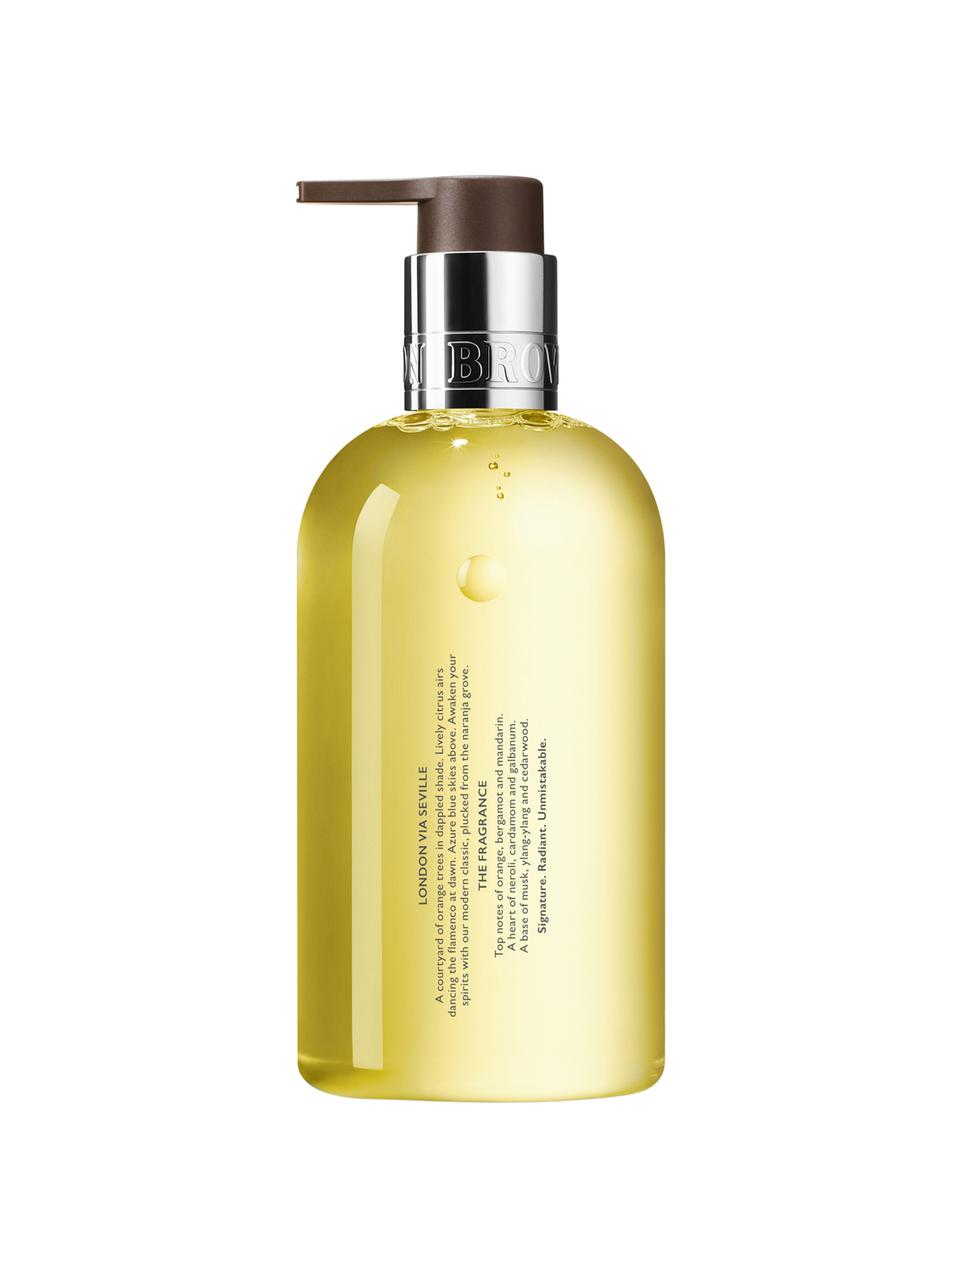 Flüssige Handseife Molton (Orange & Bergamotte), Behälter: Recycelbarer Kunststoff, Gelb, Ø 6 x H 15 cm